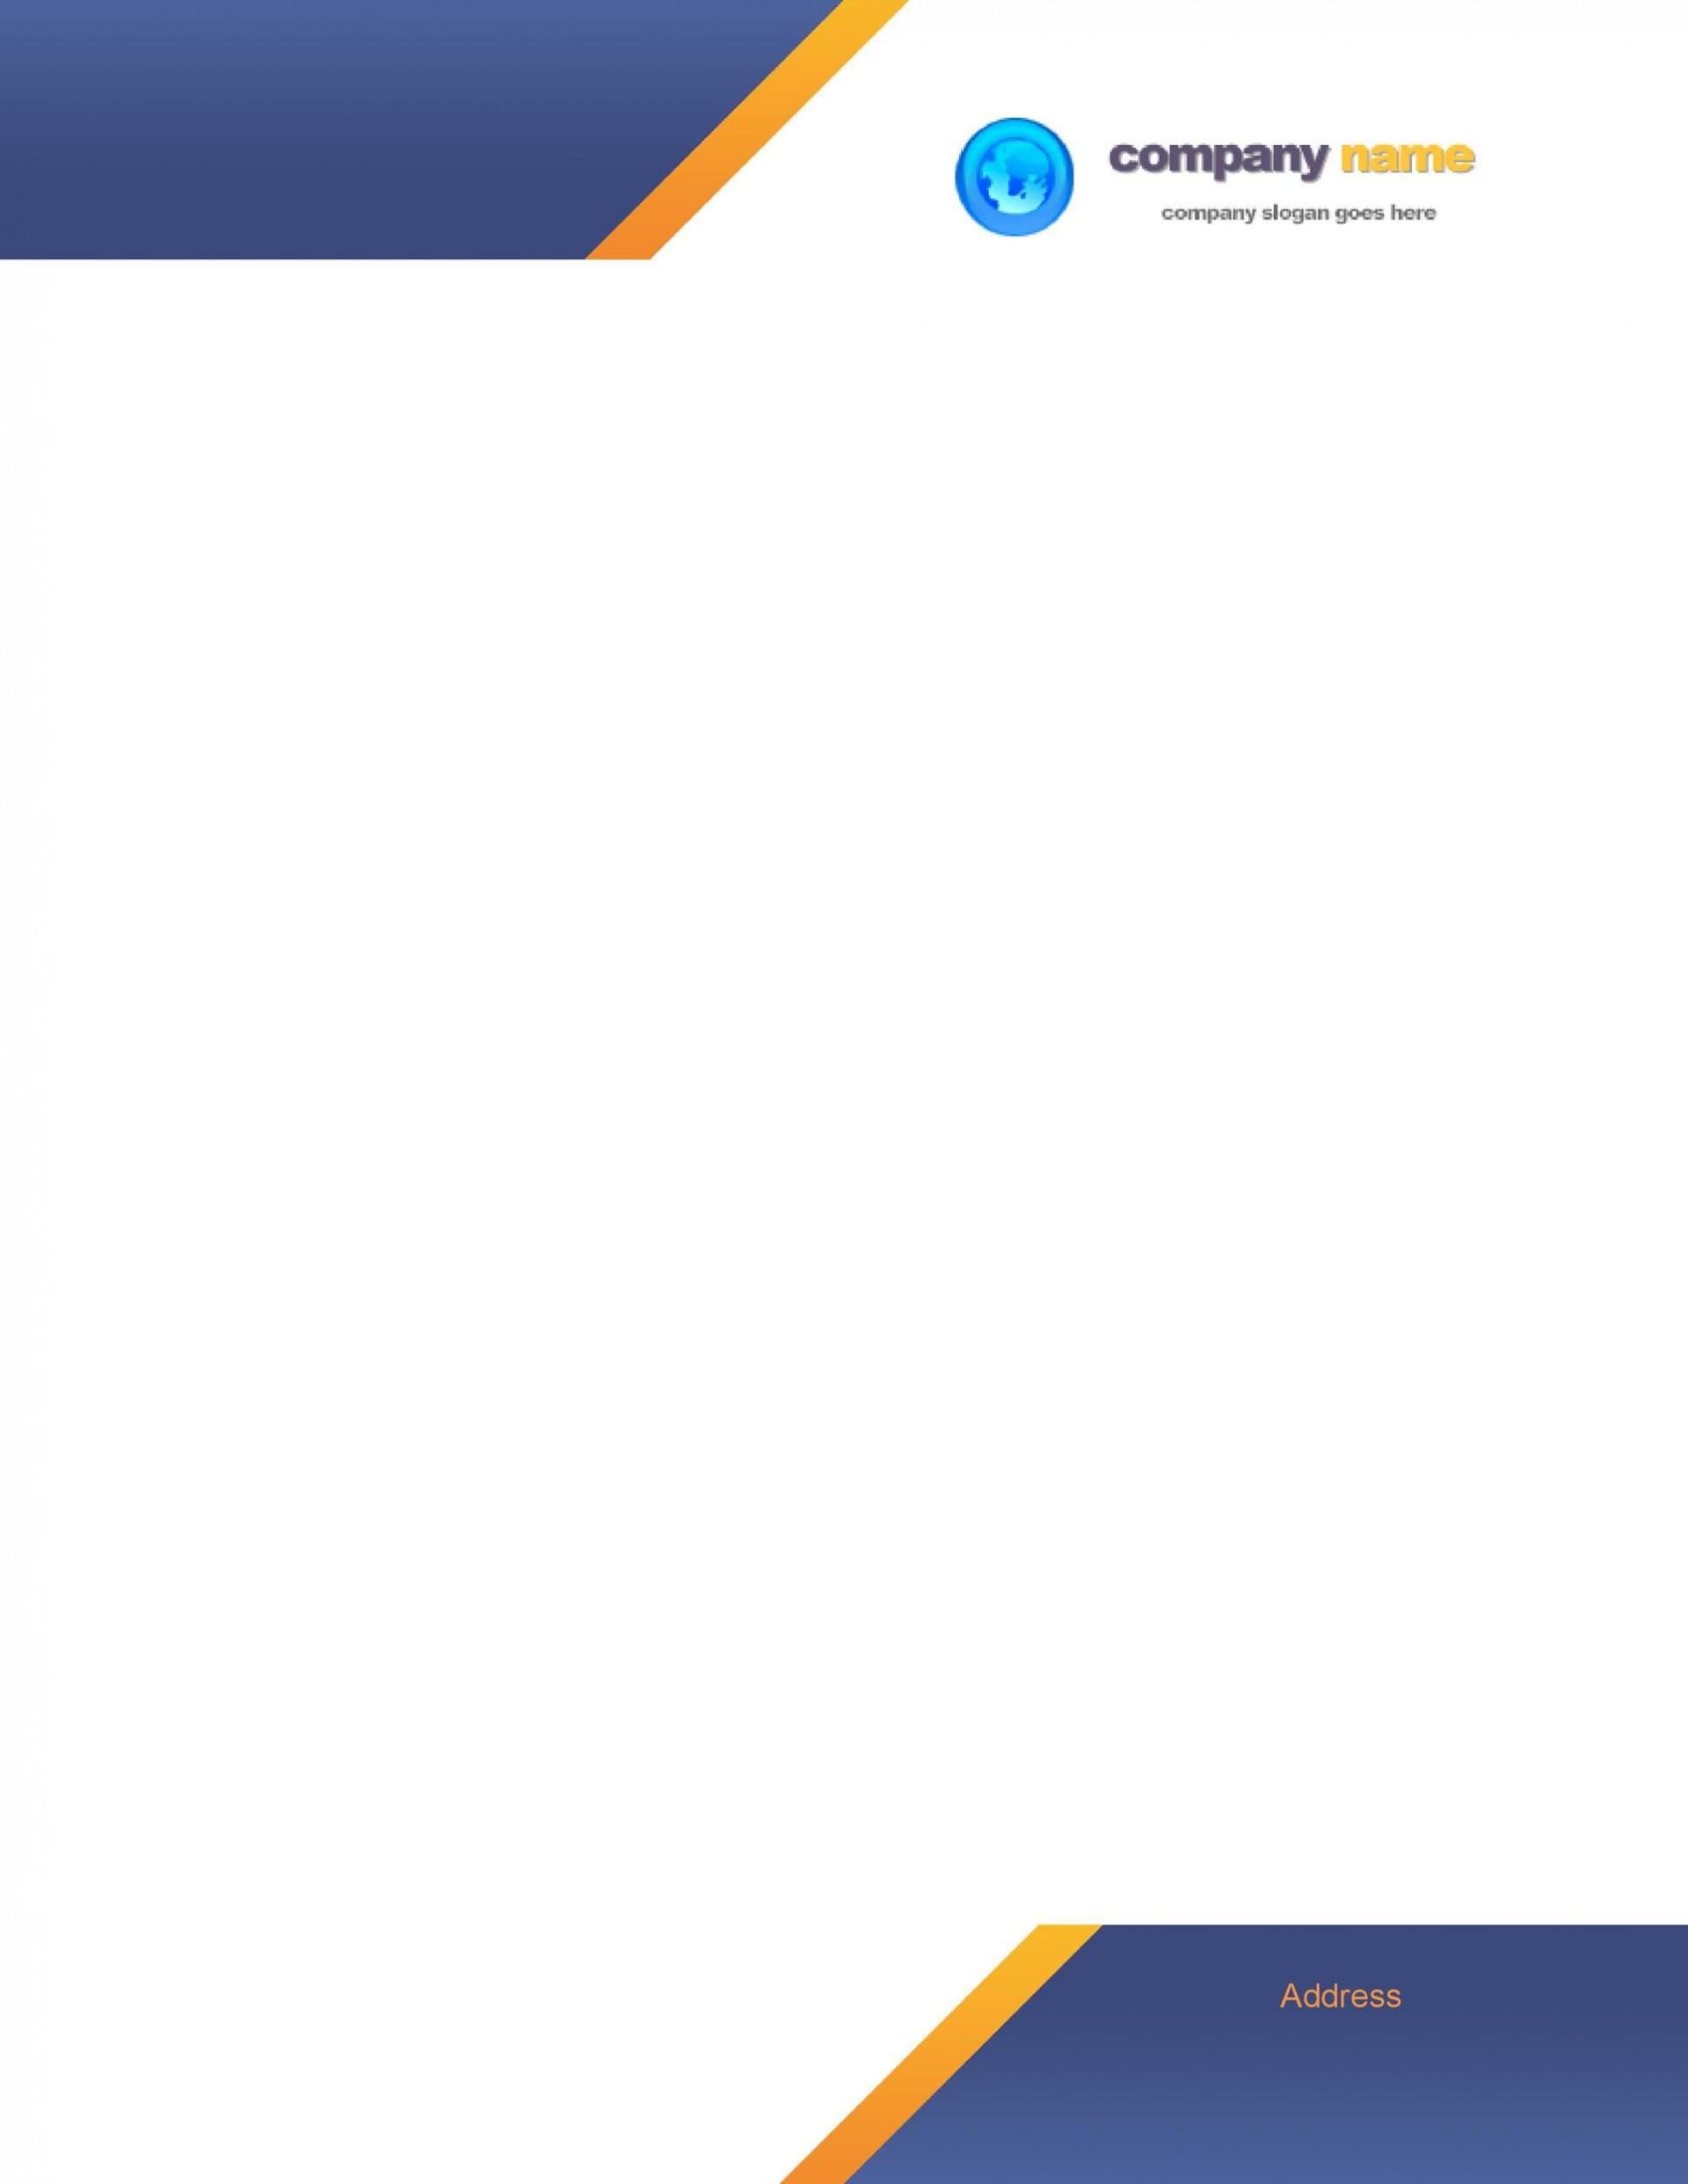 007 Unbelievable Letterhead Format In Word Free Download Pdf High Resolution 1920